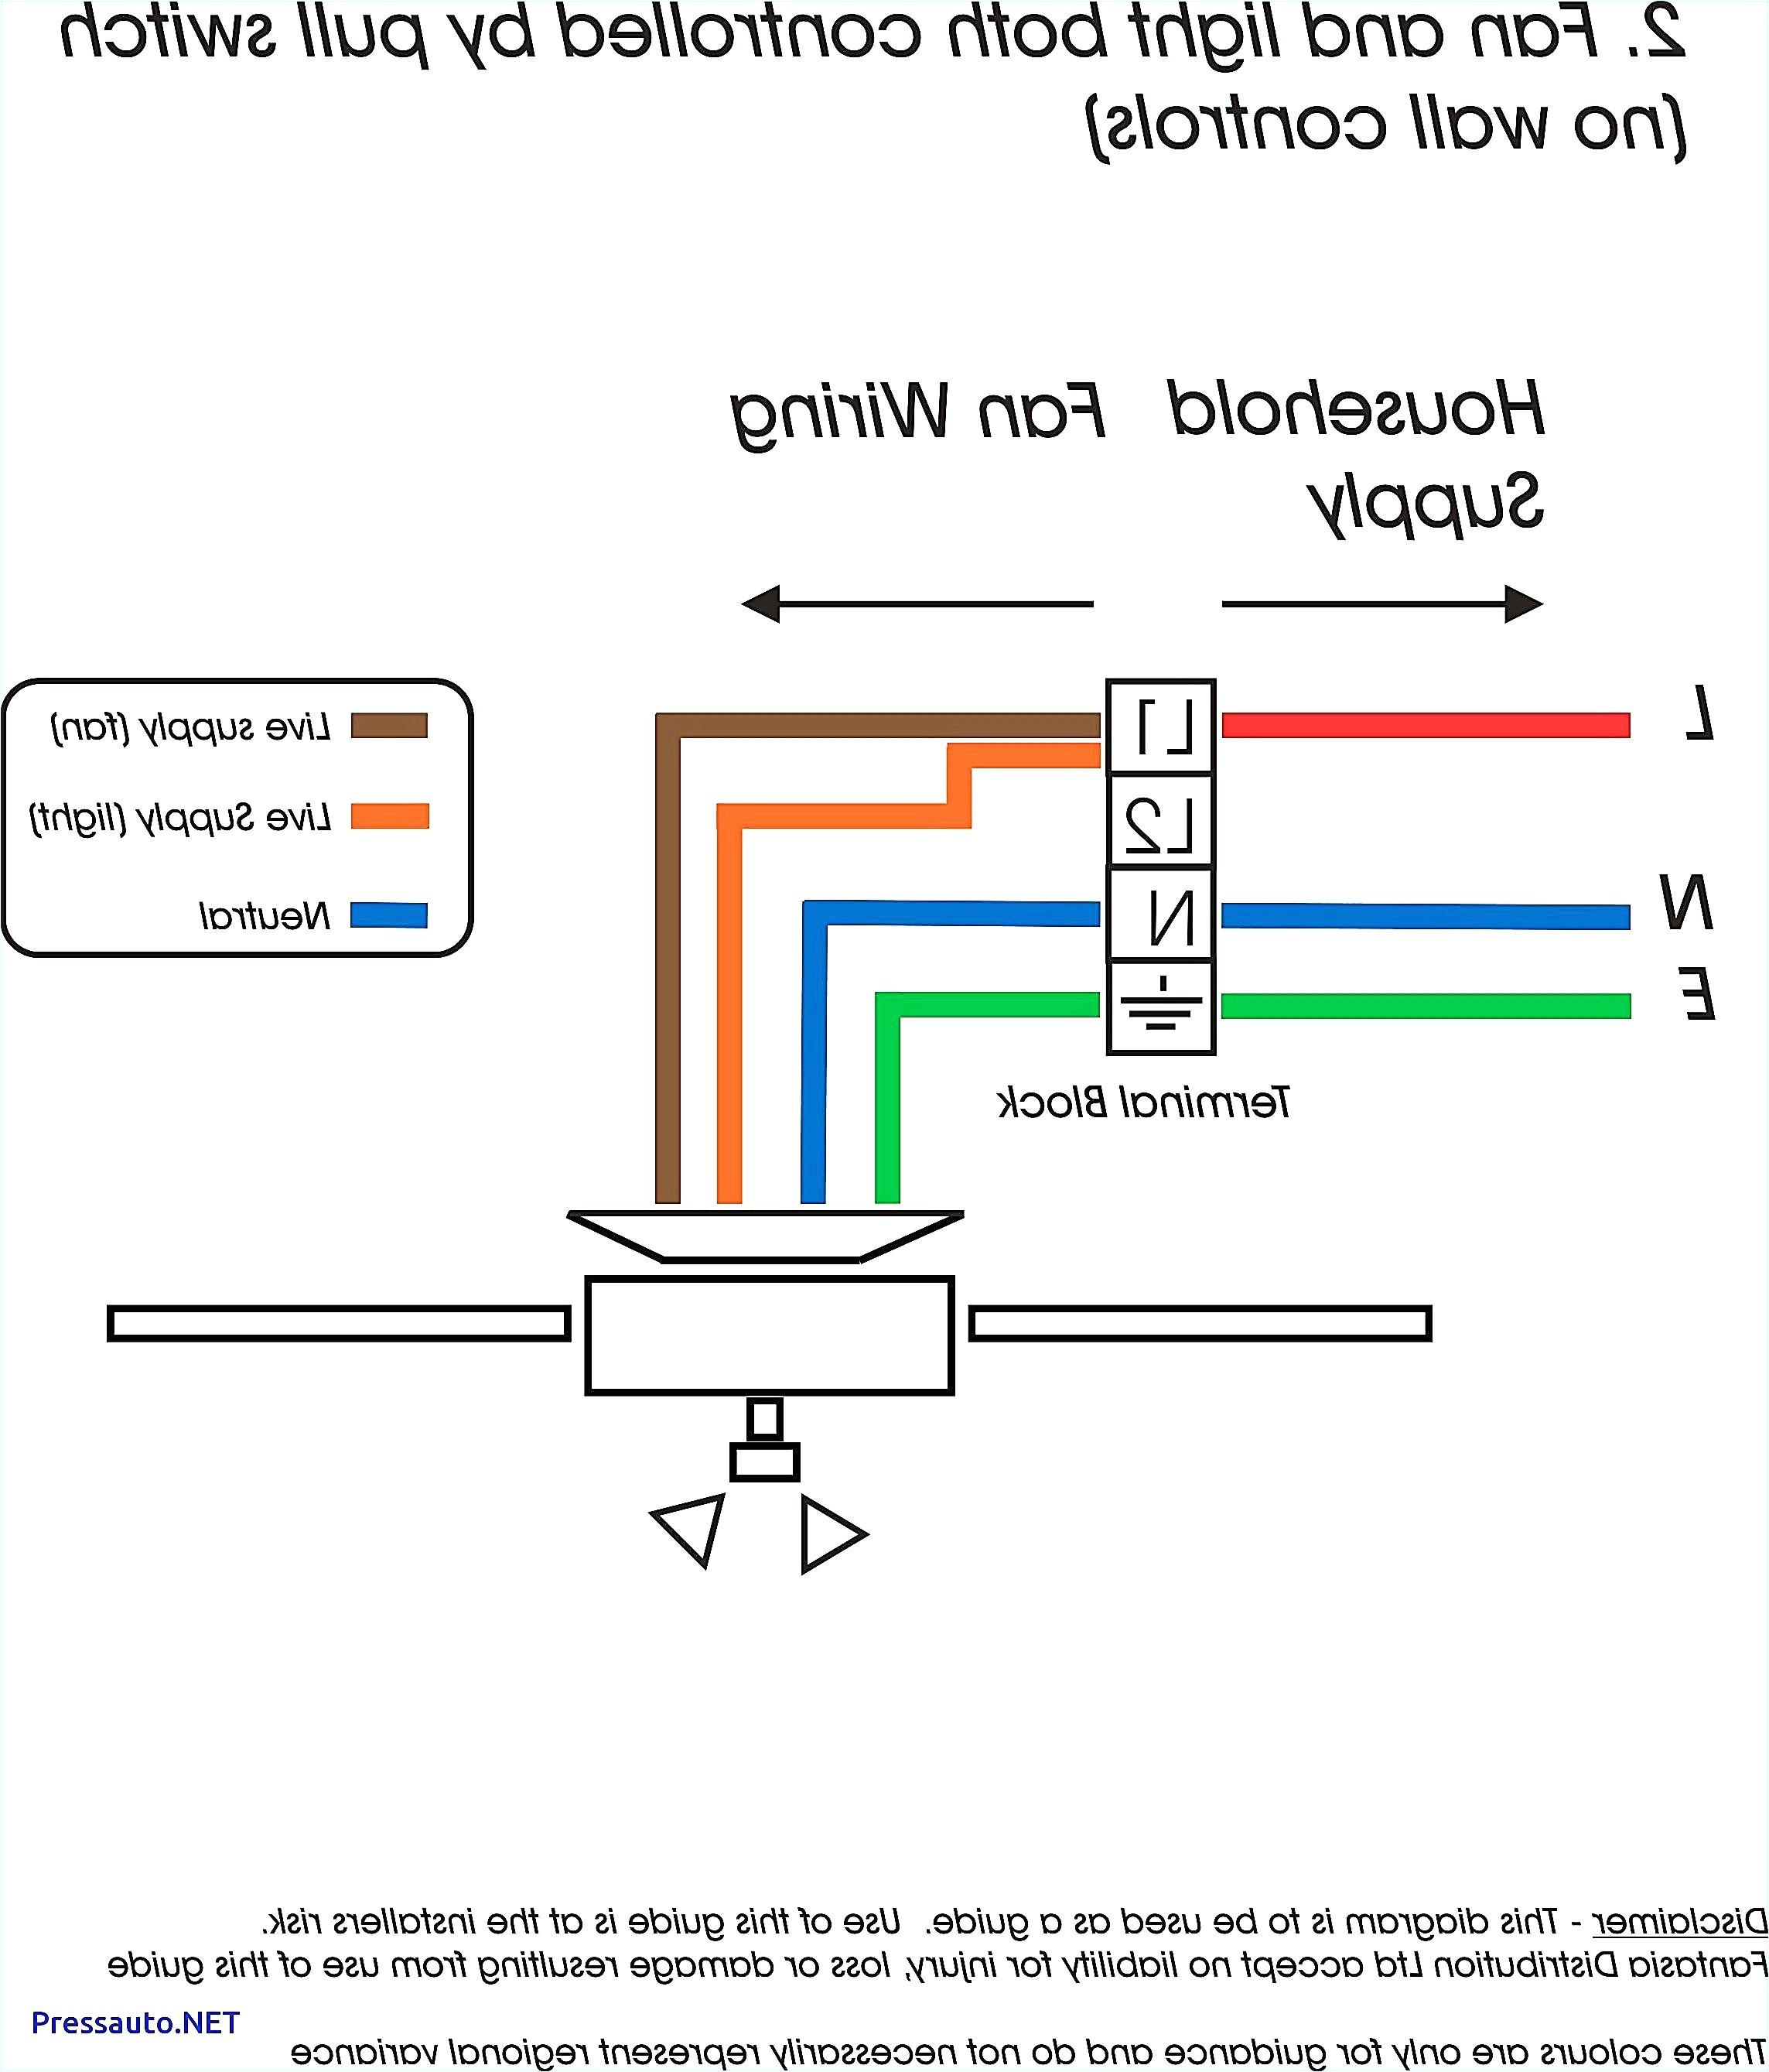 electric heat thermostat wiring diagram download wiring diagram for electric baseboard heater new wiring diagram